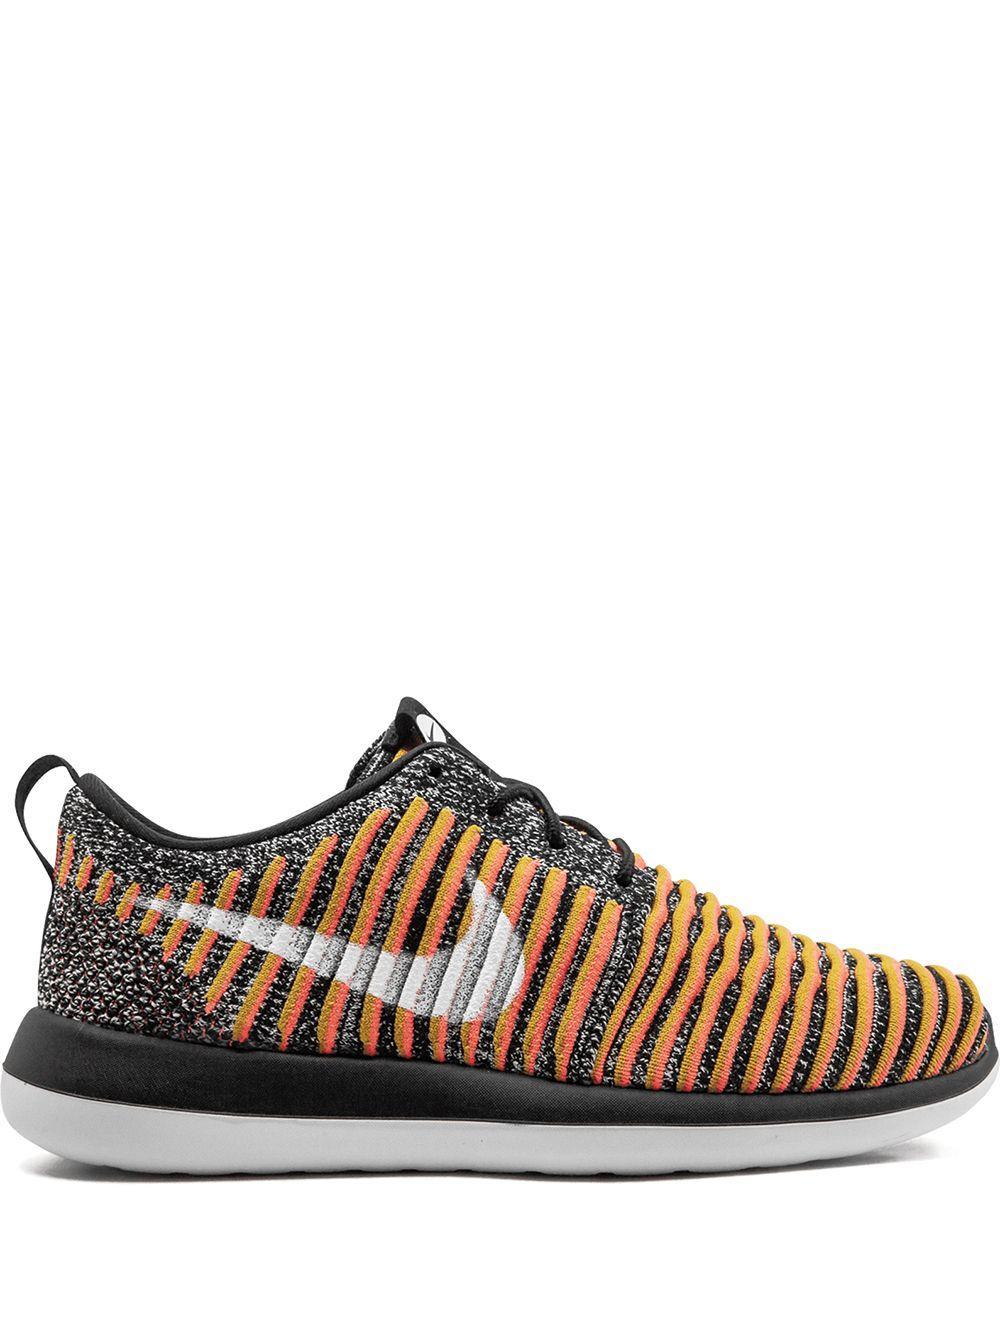 נעלי סניקרס נייק לנשים Nike Roshe Two Flyknit - צבעוני כהה